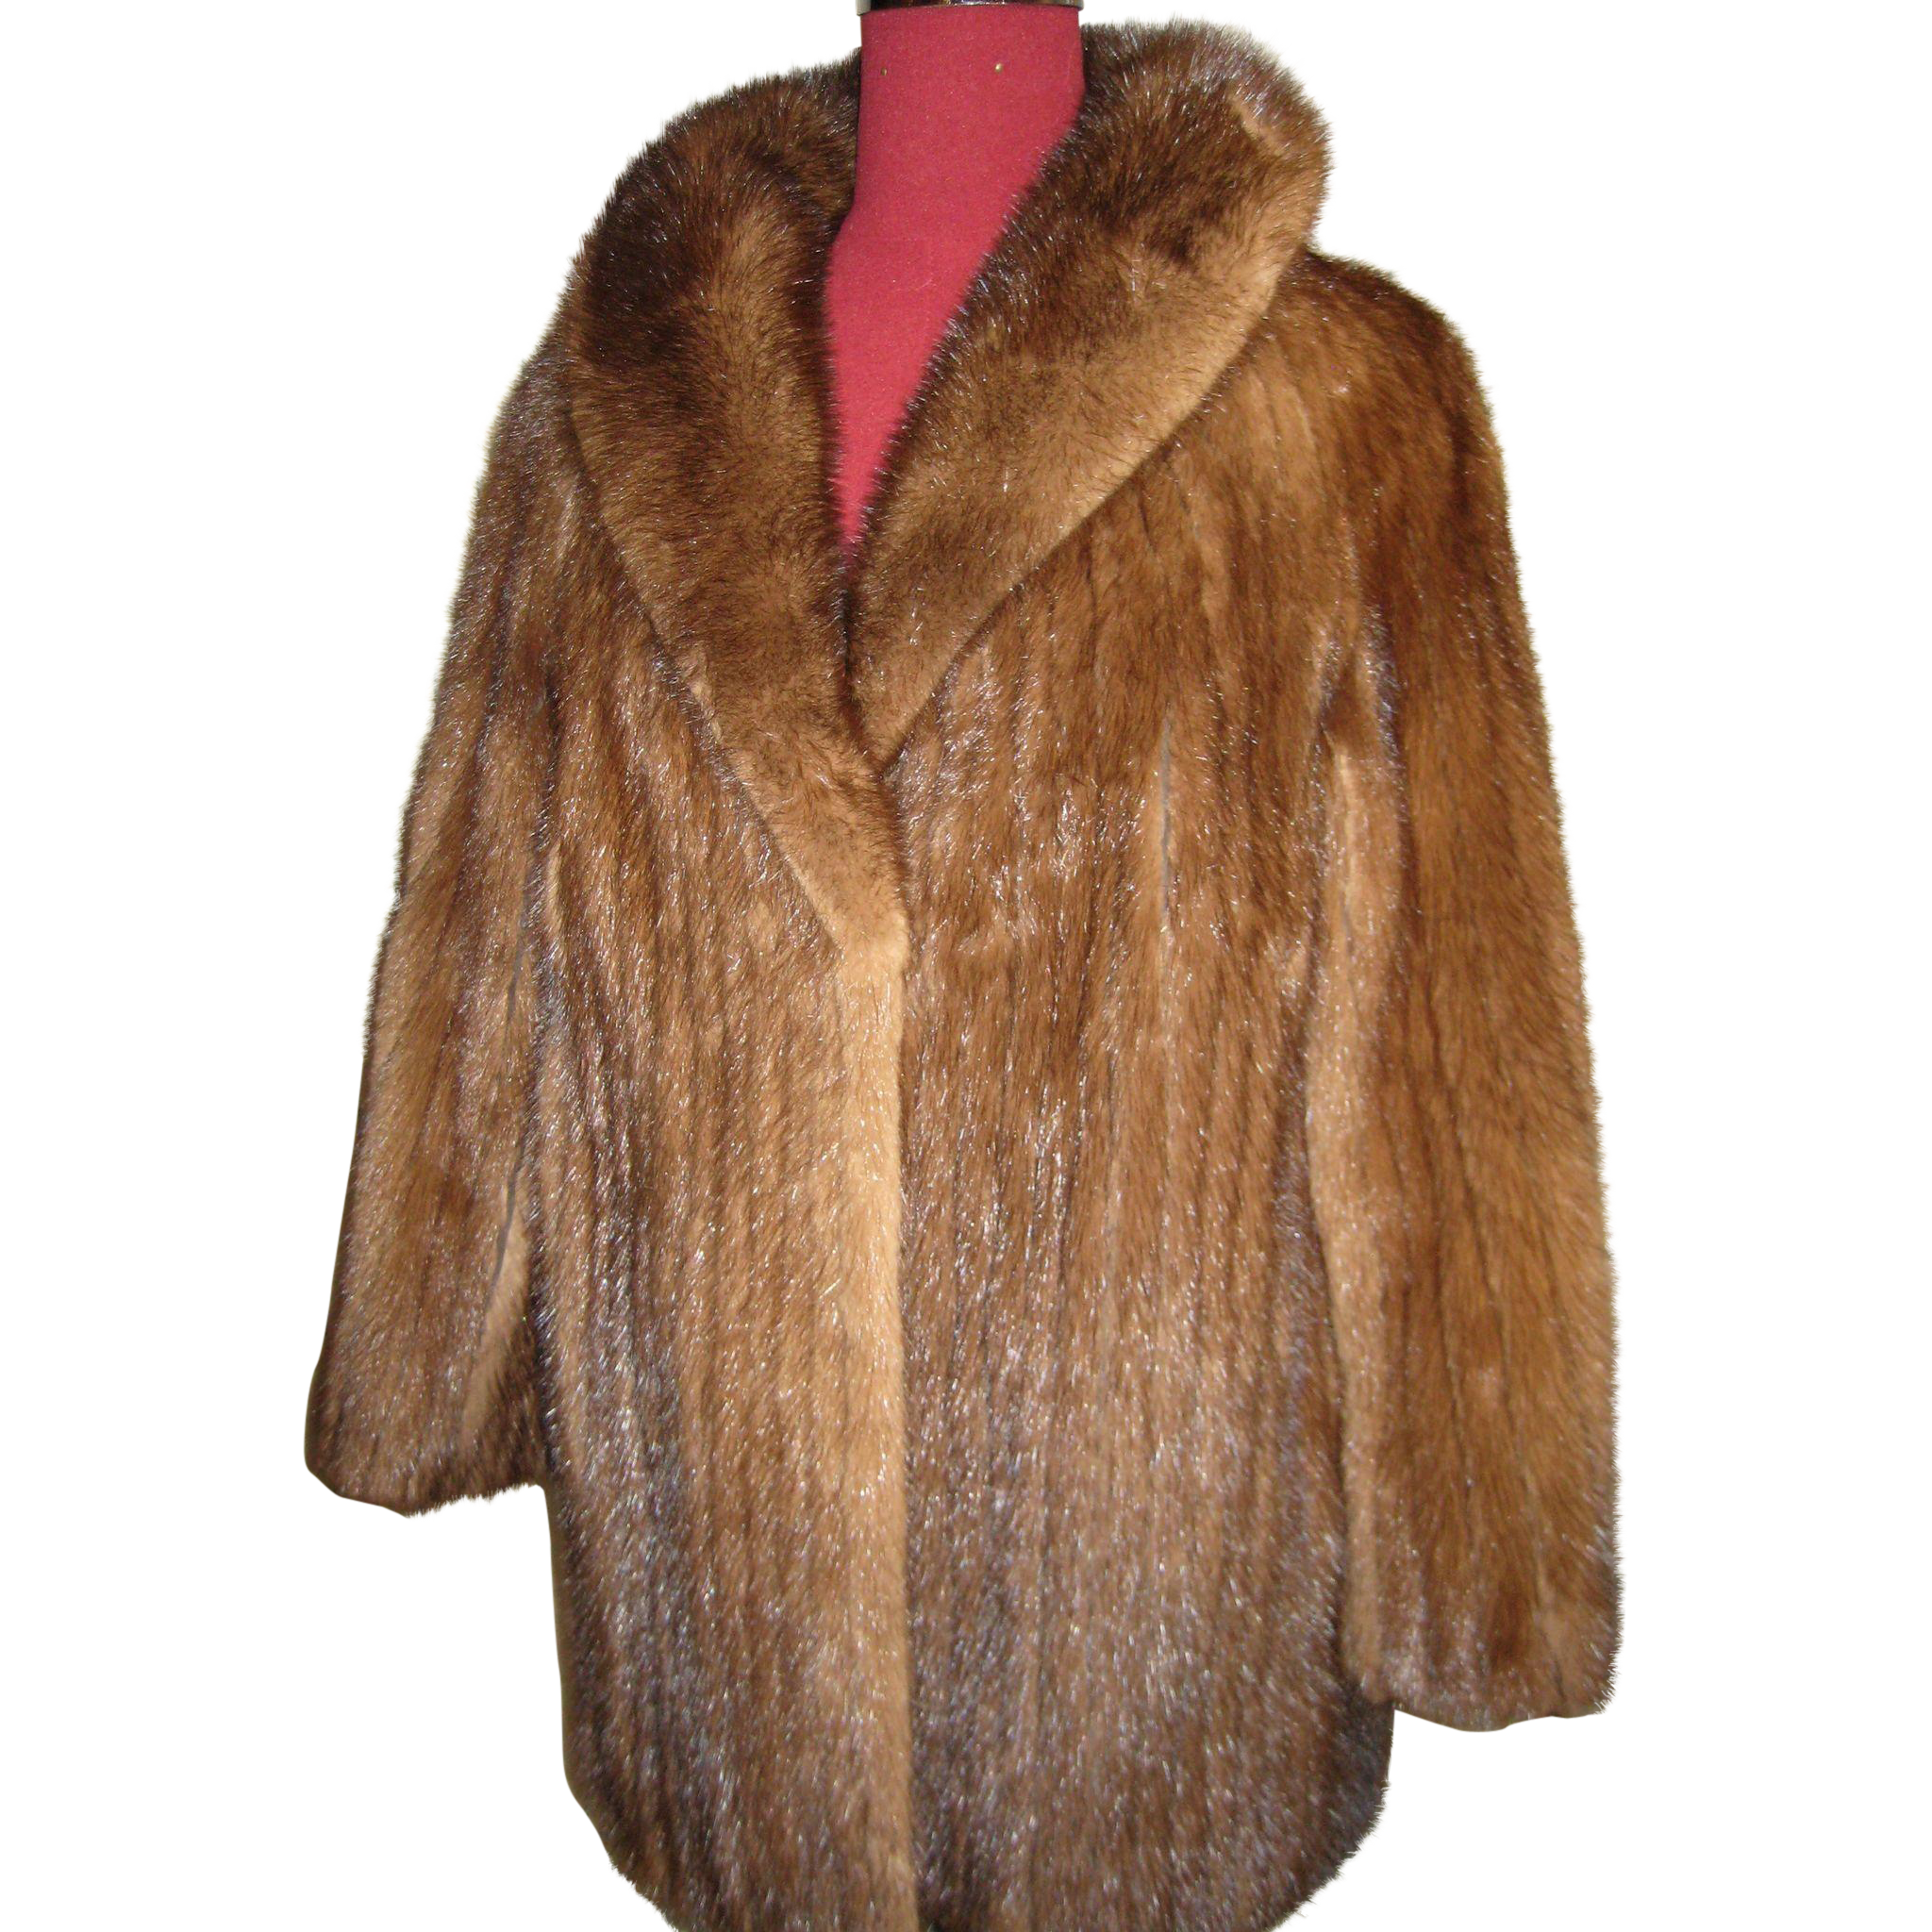 Superb Demi-Buff Mink strips Fur Jacket w large collar